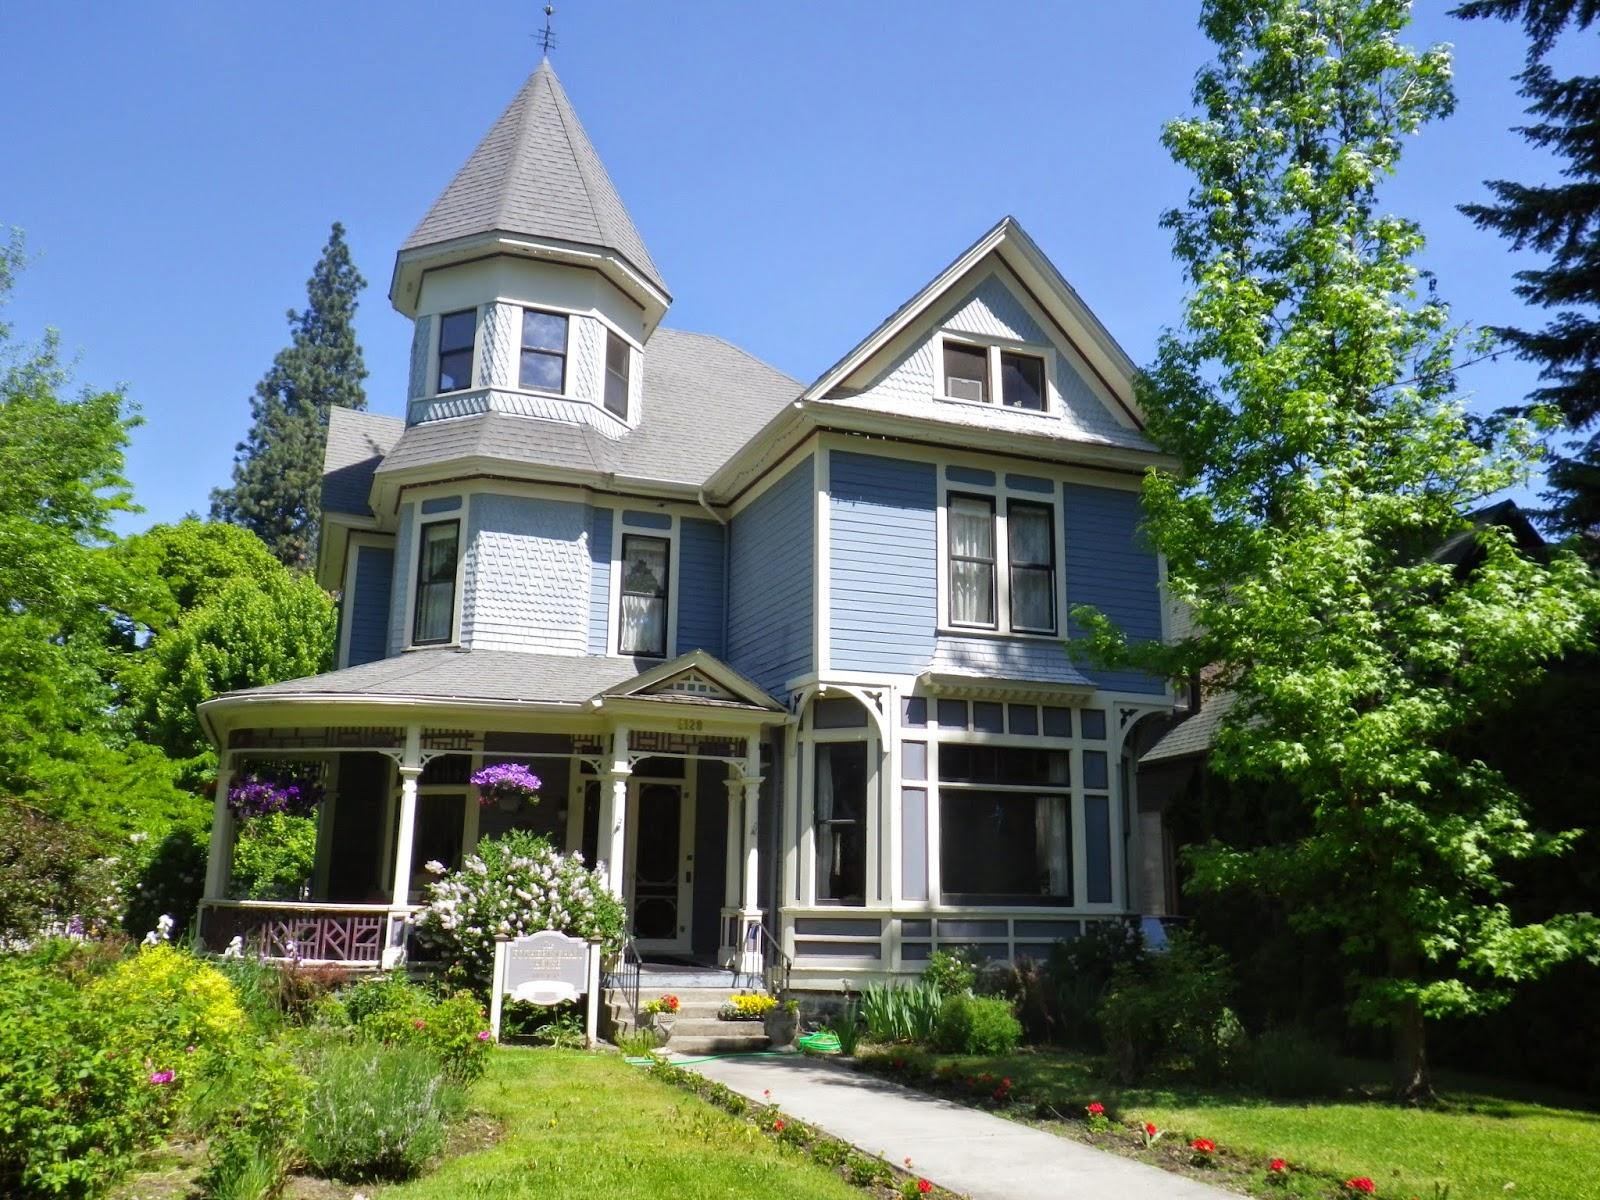 spokane 2015 day 10 spokane history. Black Bedroom Furniture Sets. Home Design Ideas